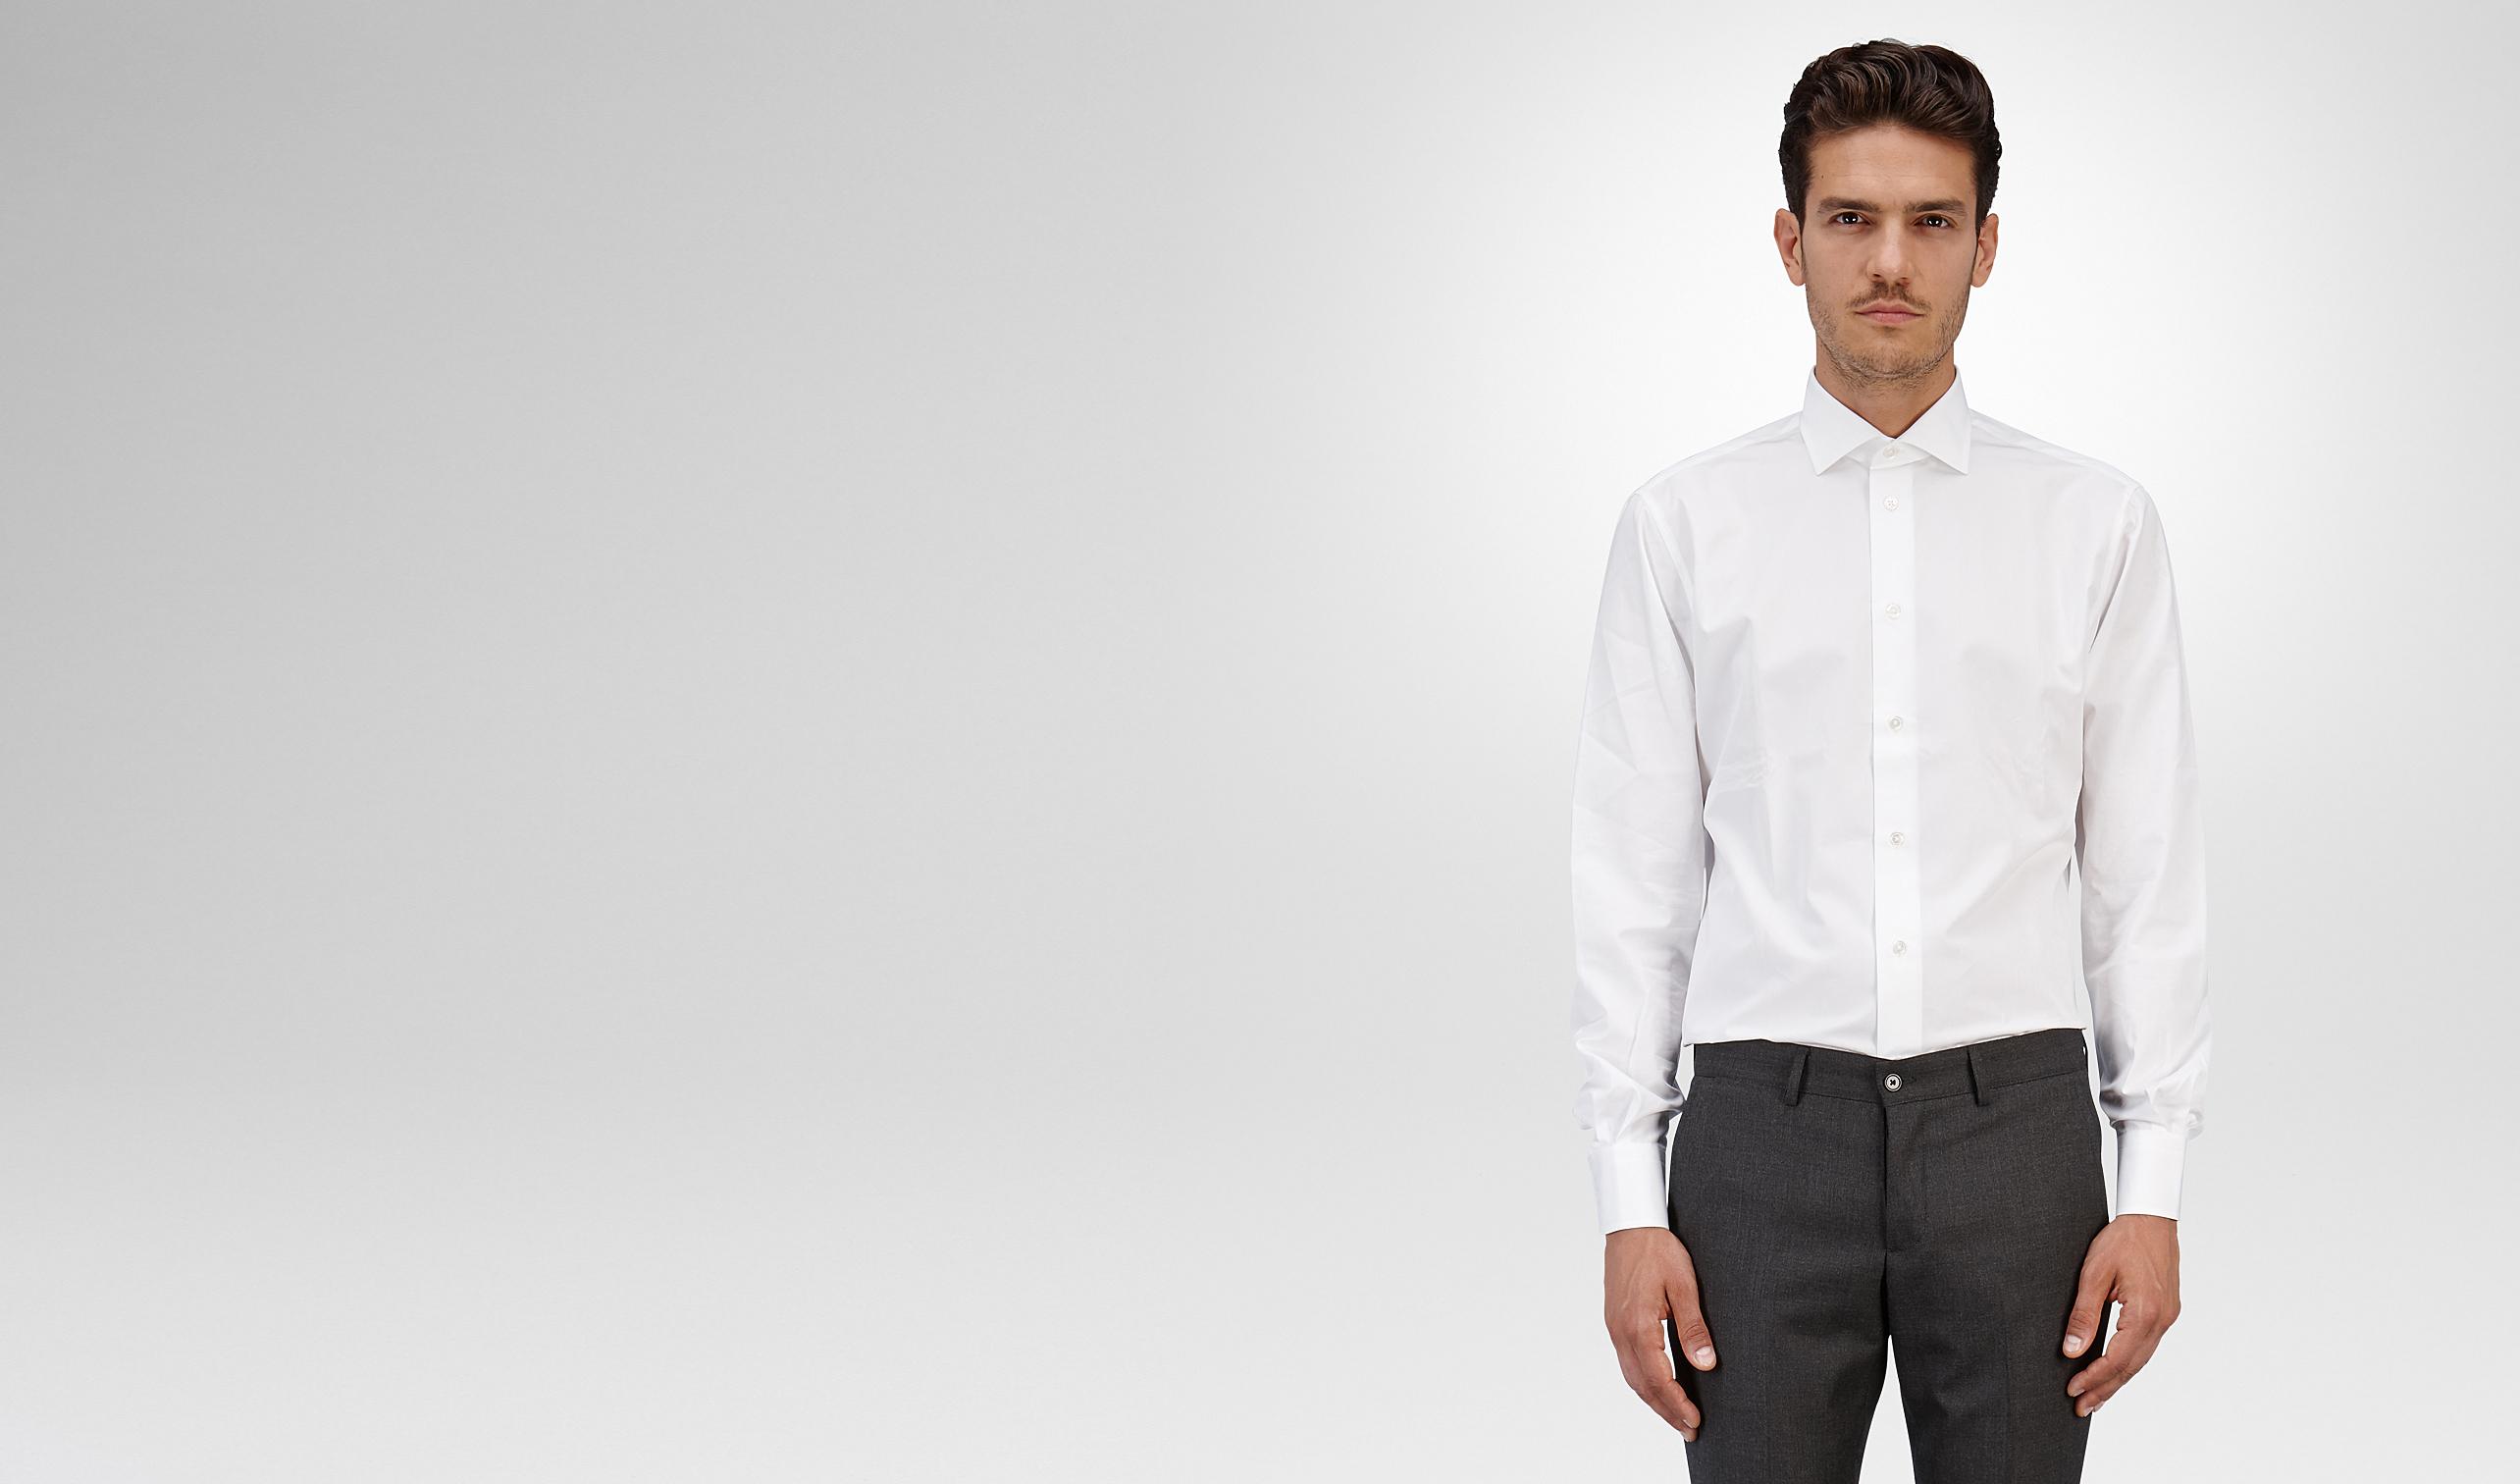 BOTTEGA VENETA Formalwear oder Hemd U HEMD AUS BAUMWOLLE IN BIANCO pl